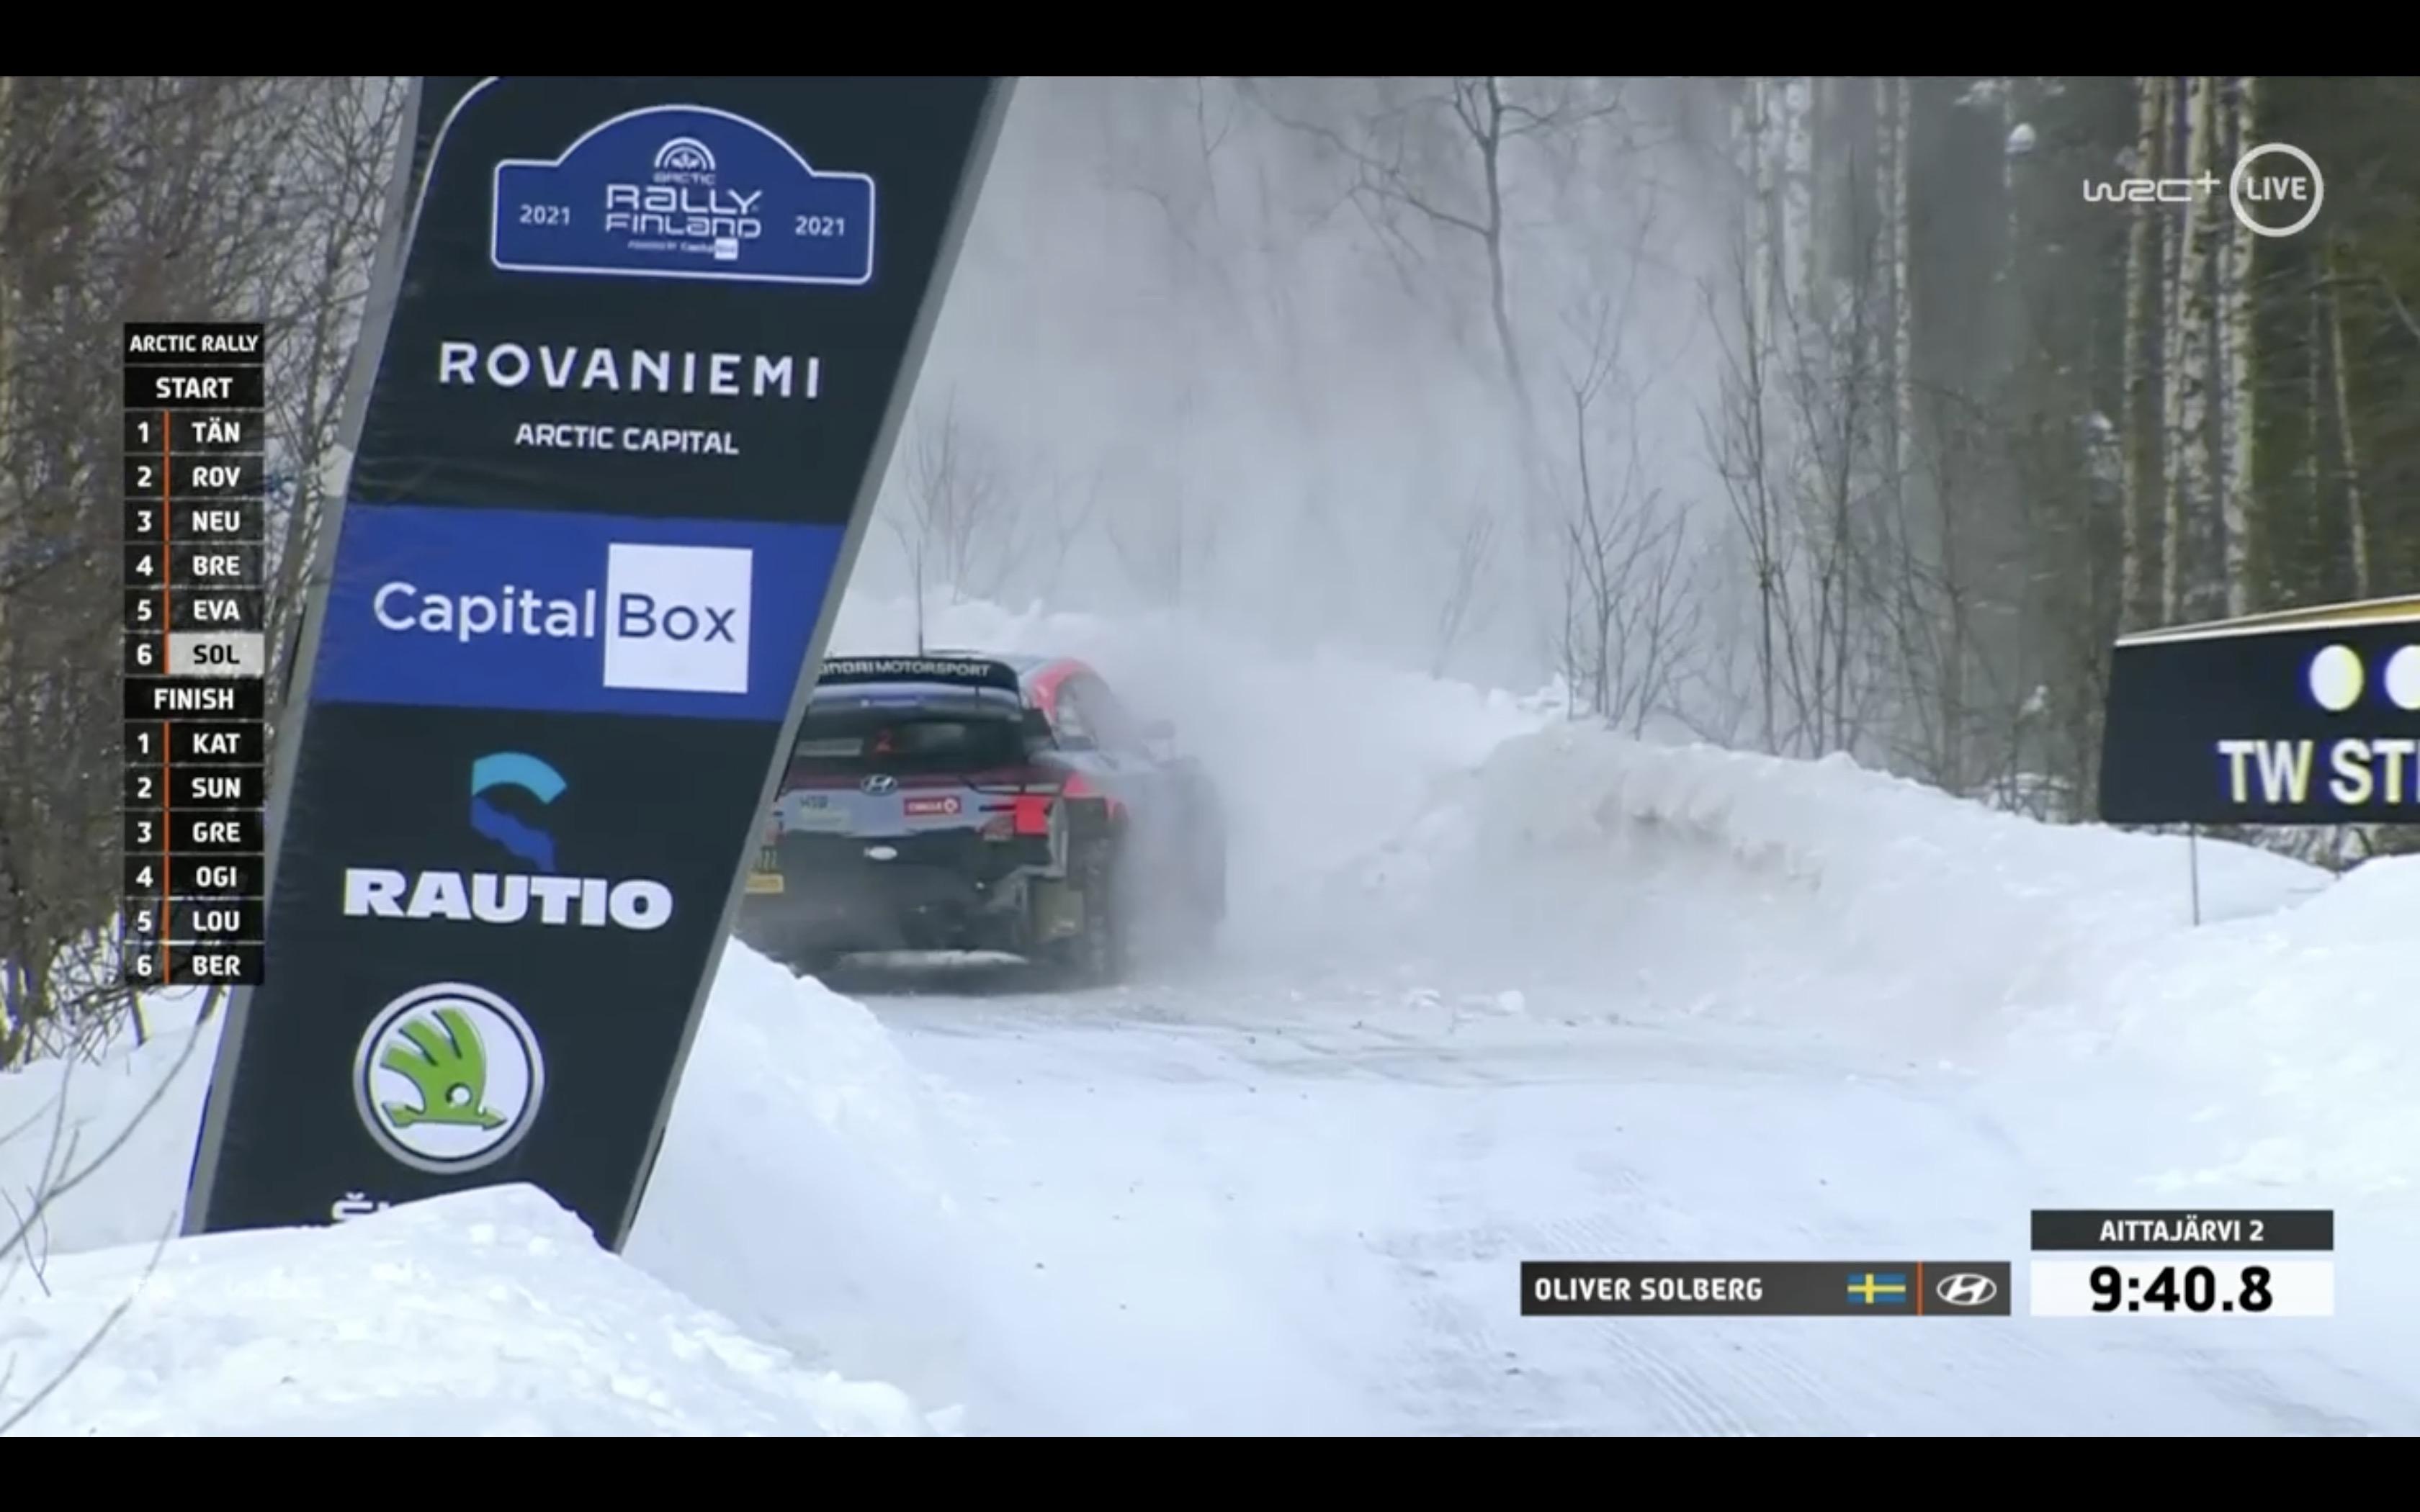 WRC: Arctic Rally Finland - Powered by CapitalBox [26-28 Febrero] - Página 8 EvT7s2bWYAICe3Z?format=jpg&name=4096x4096